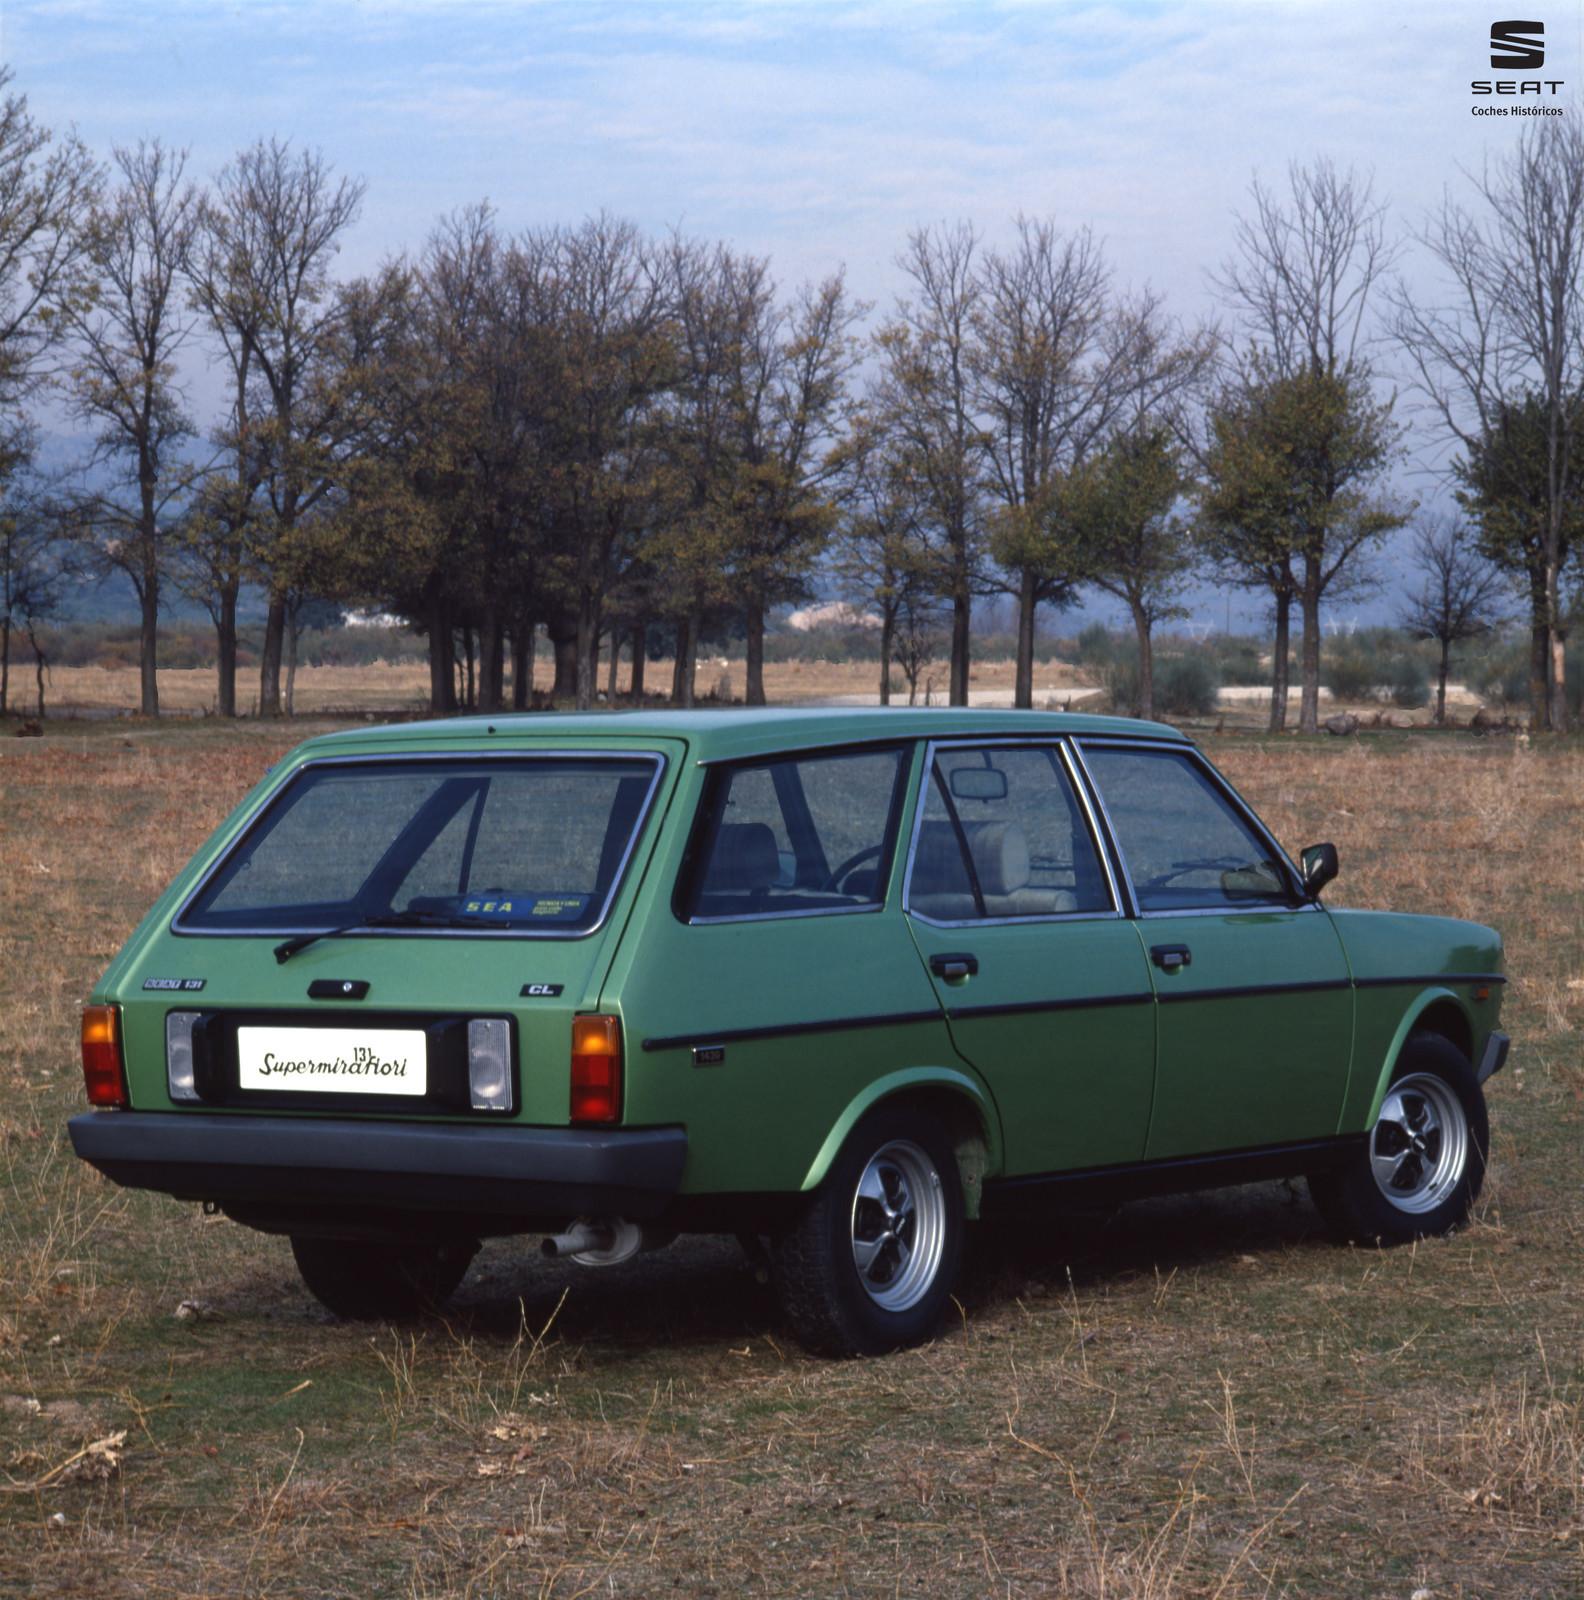 Foto de Motor SEAT 1430 - fotos históricas (28/49)